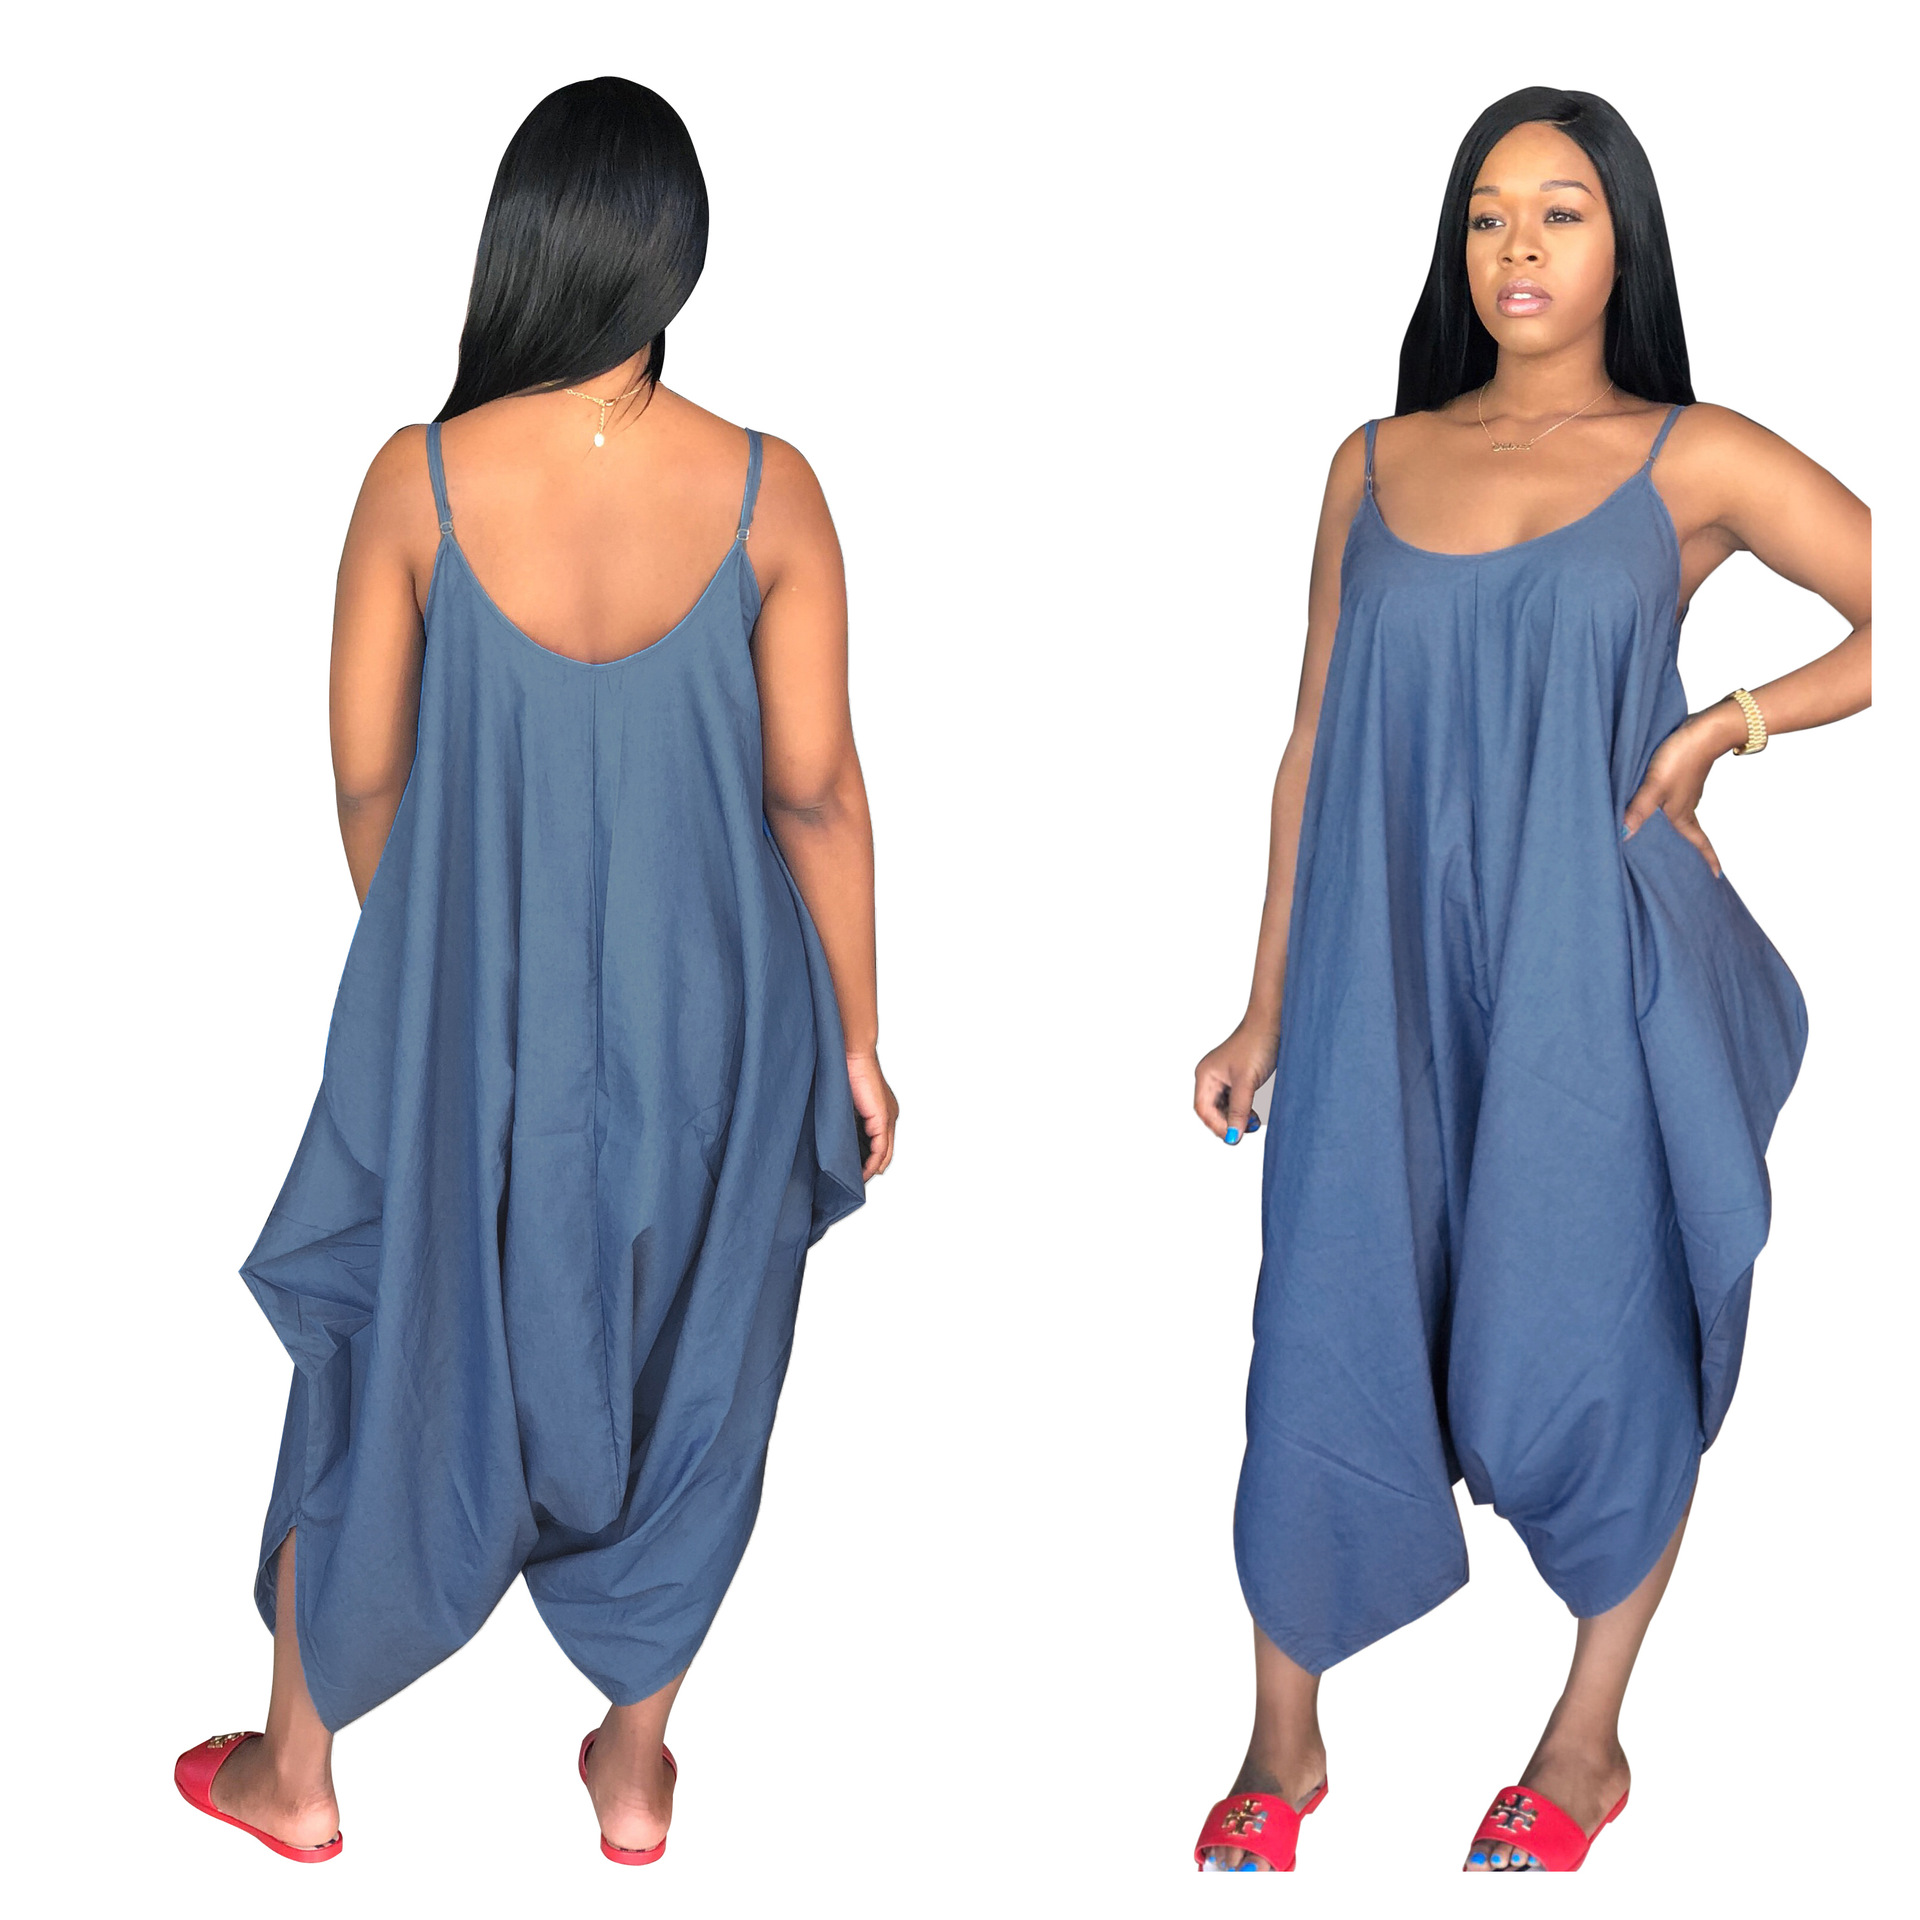 professional sale popular design nice cheap US $18.31 20% OFF|Plus Size 3 XL casual Jumpsuit Big Women Loosed Paysuit  Stripe confortable Jeans Jumpsuit Denim SMR9004-in Jumpsuits from Women's  ...